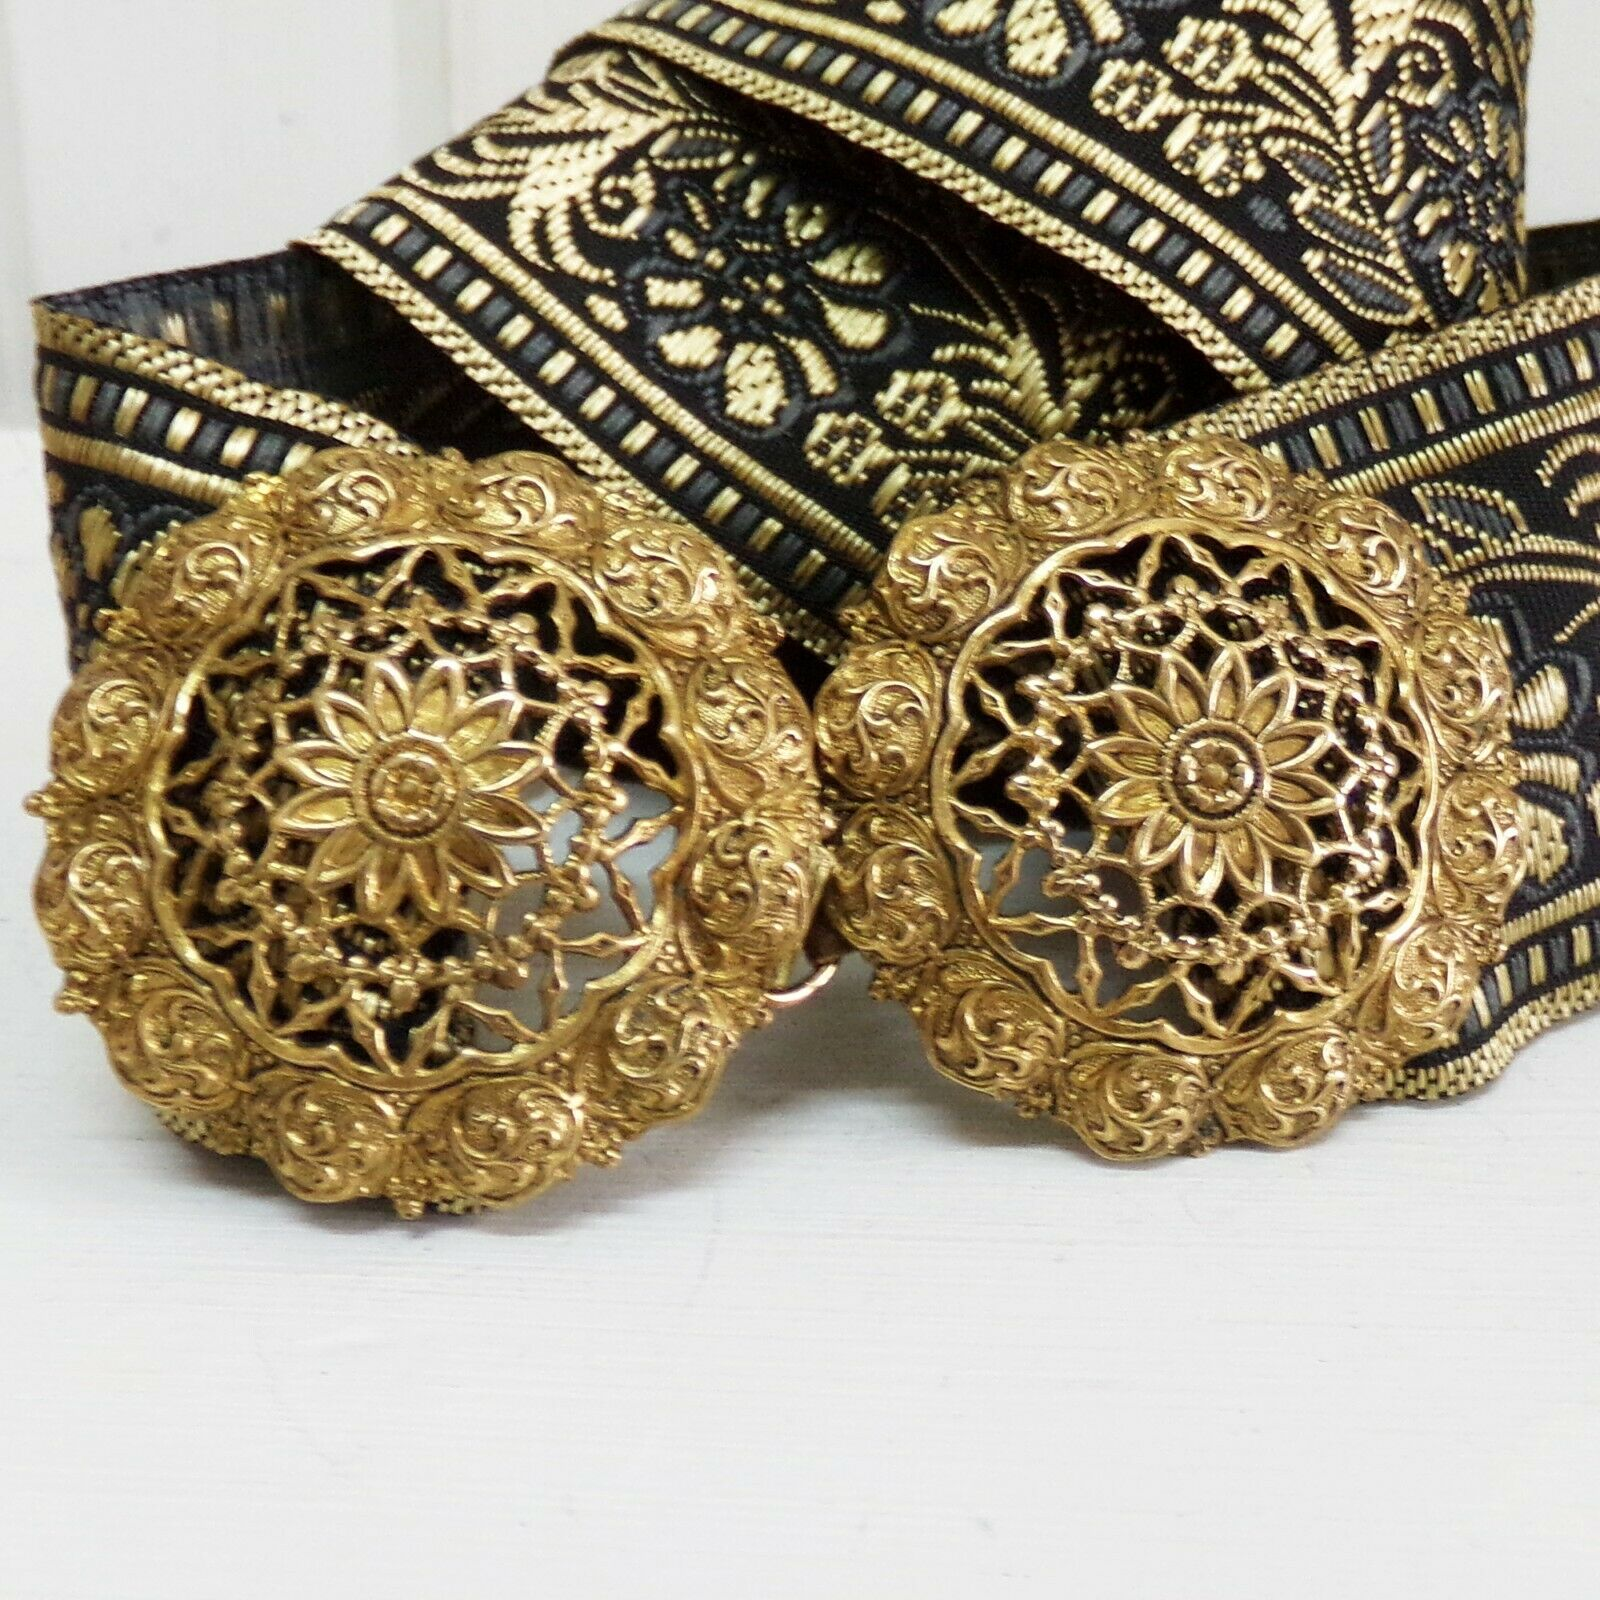 Antique victorian Filigree flower brass metal vintage buckle ornated interlock